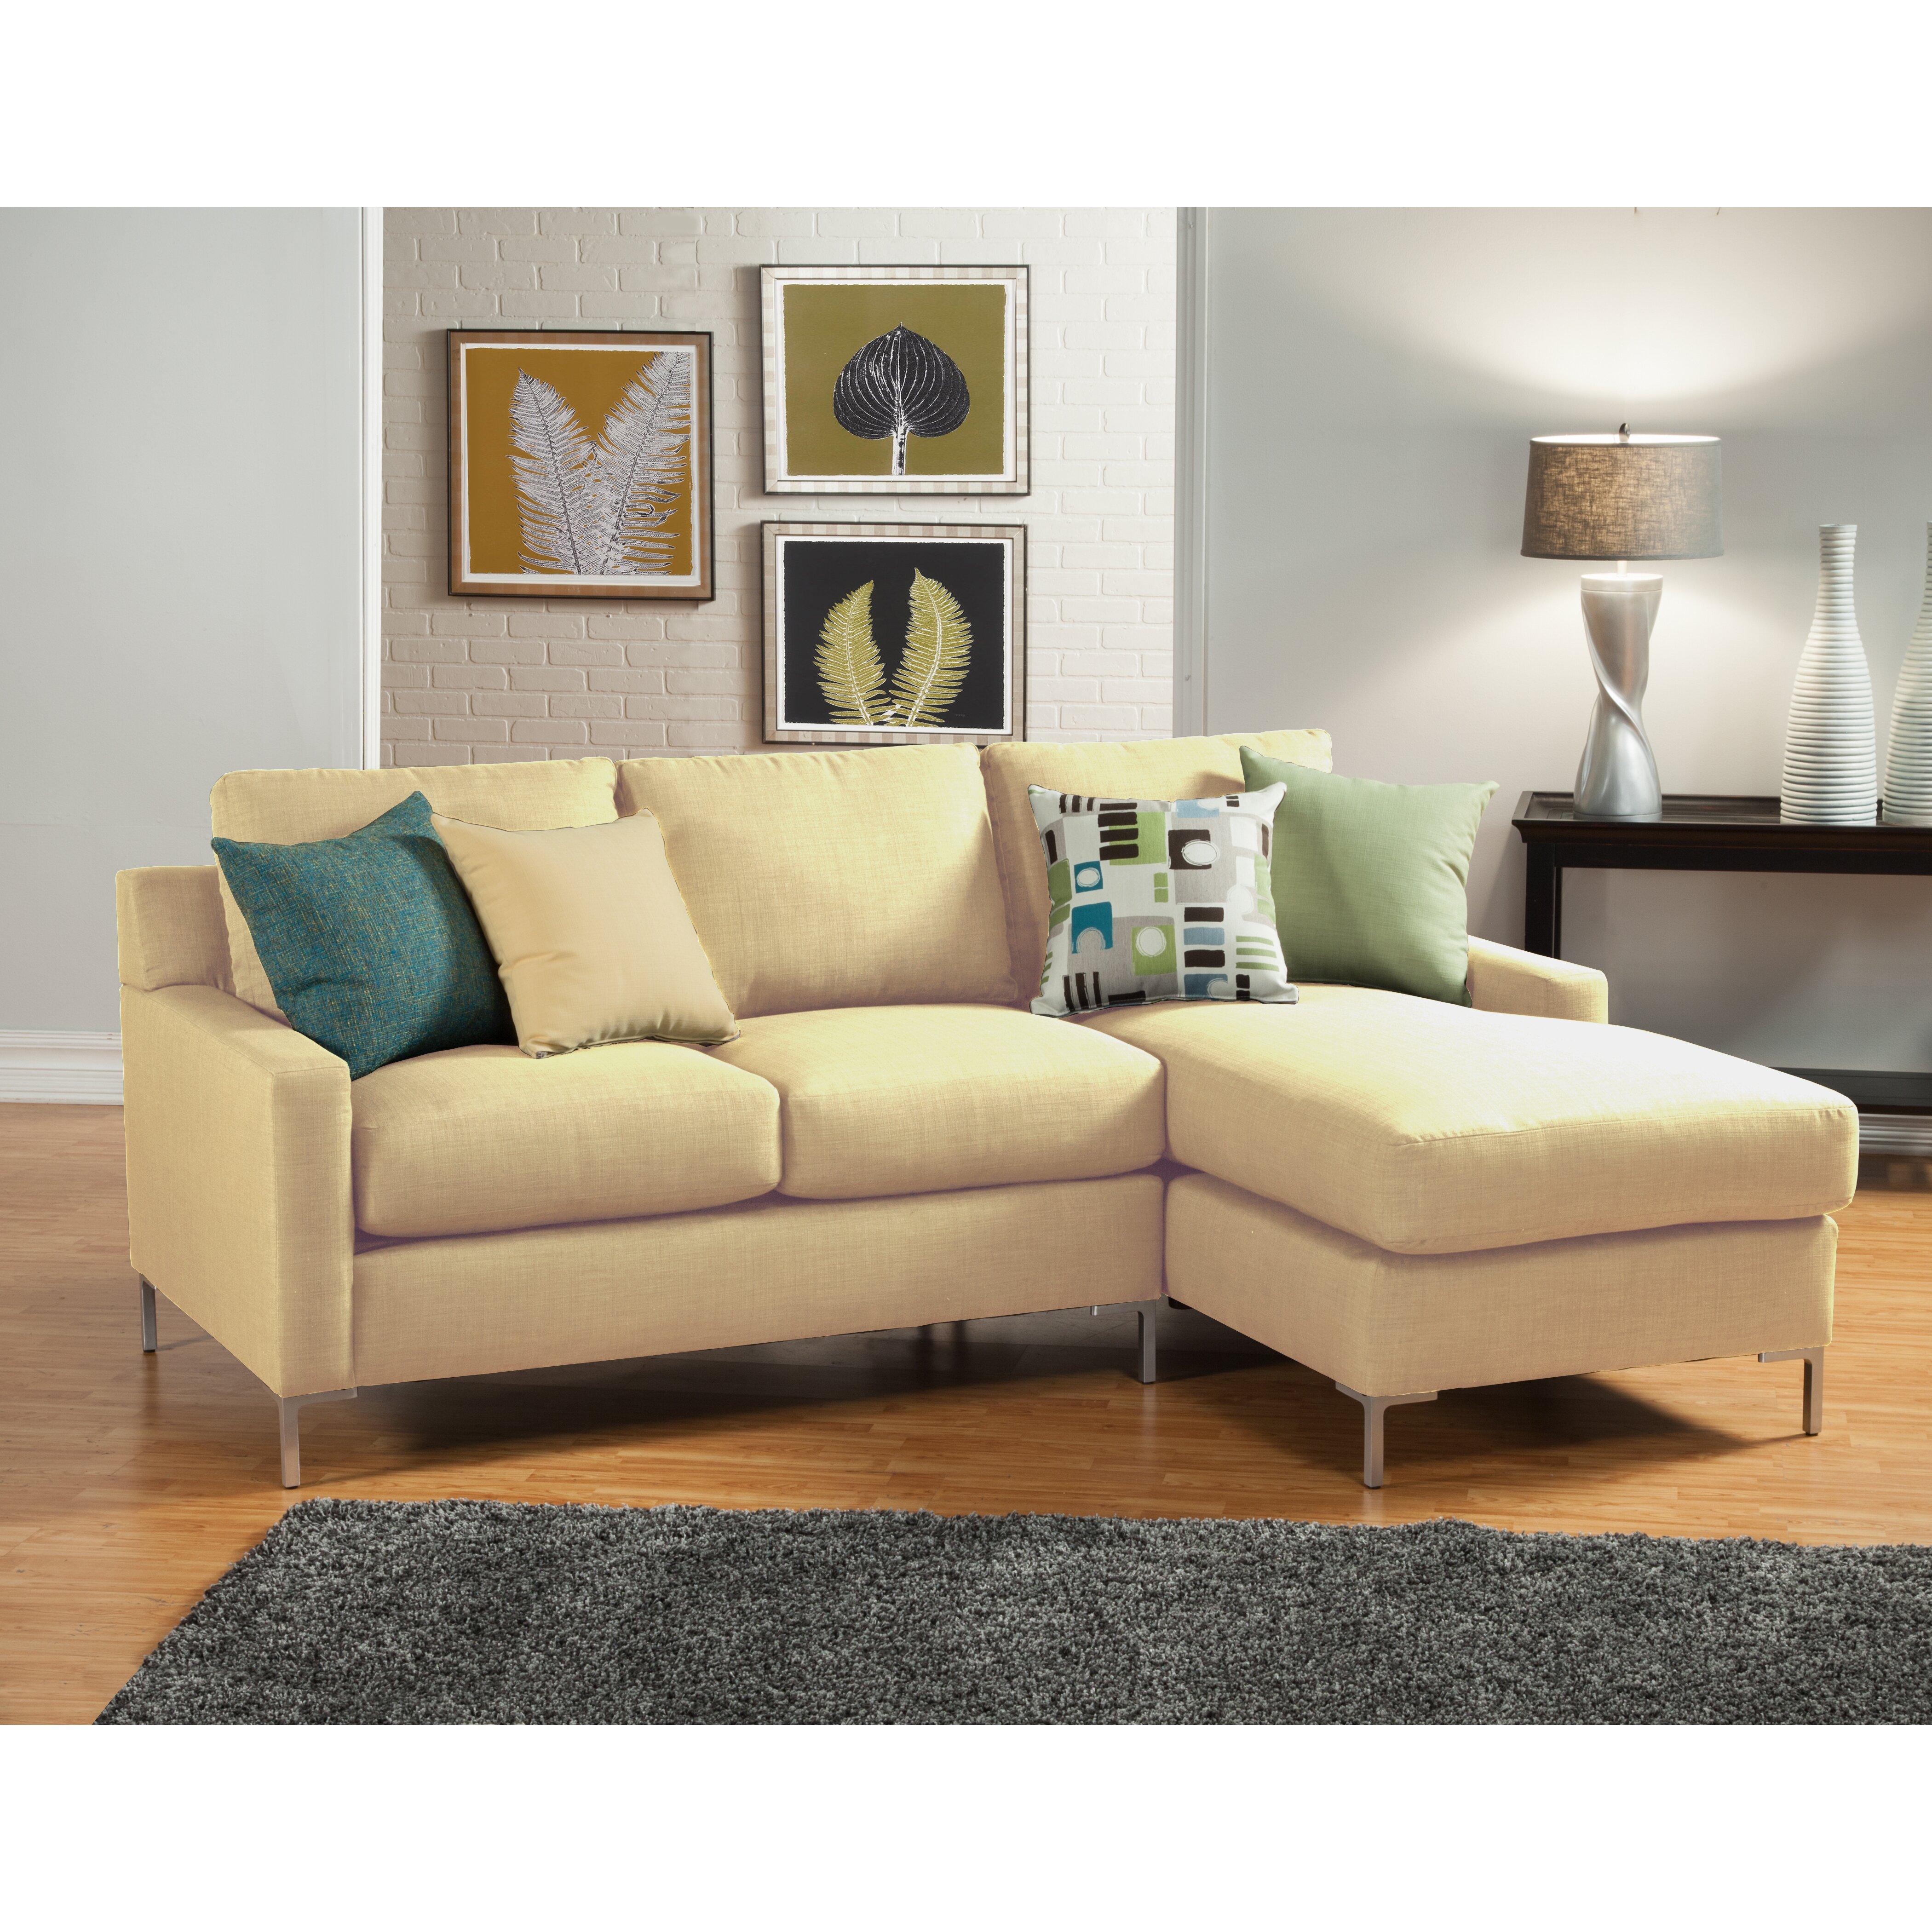 Hokku designs albany sectional reviews wayfair for Hokku designs living room furniture